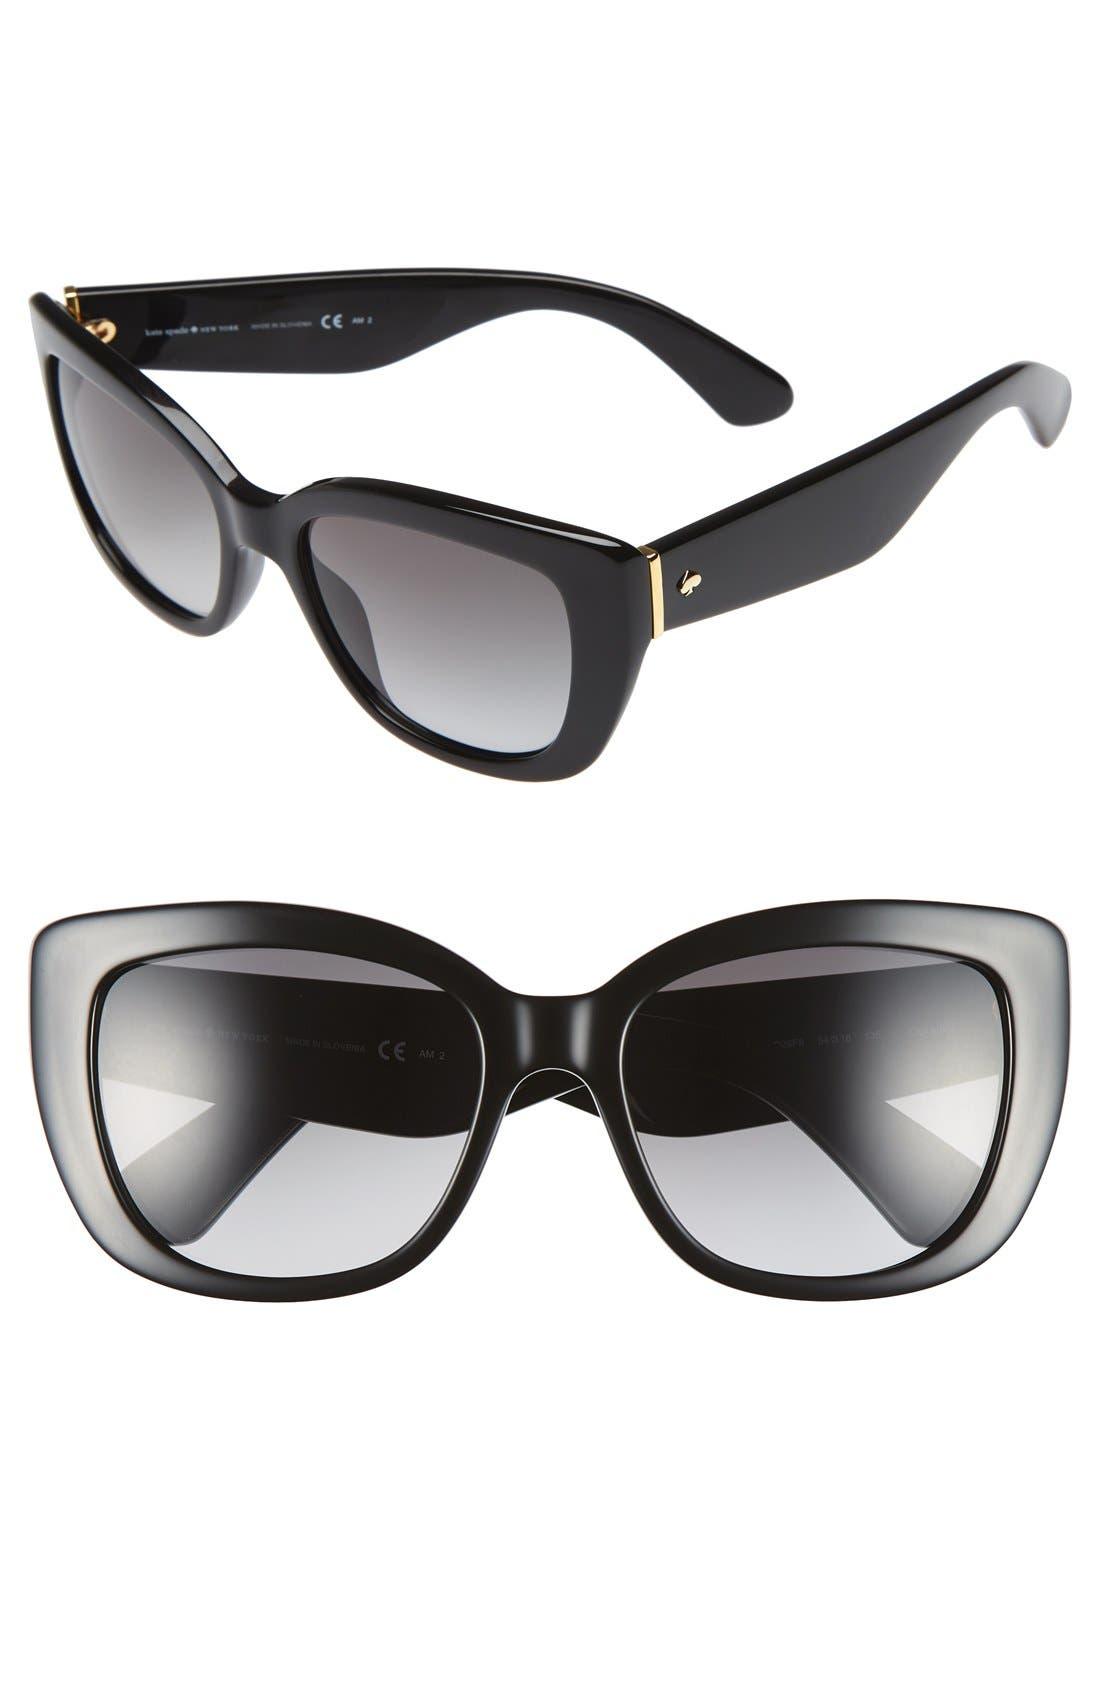 KATE SPADE NEW YORK, 'andris' 54mm sunglasses, Main thumbnail 1, color, 001